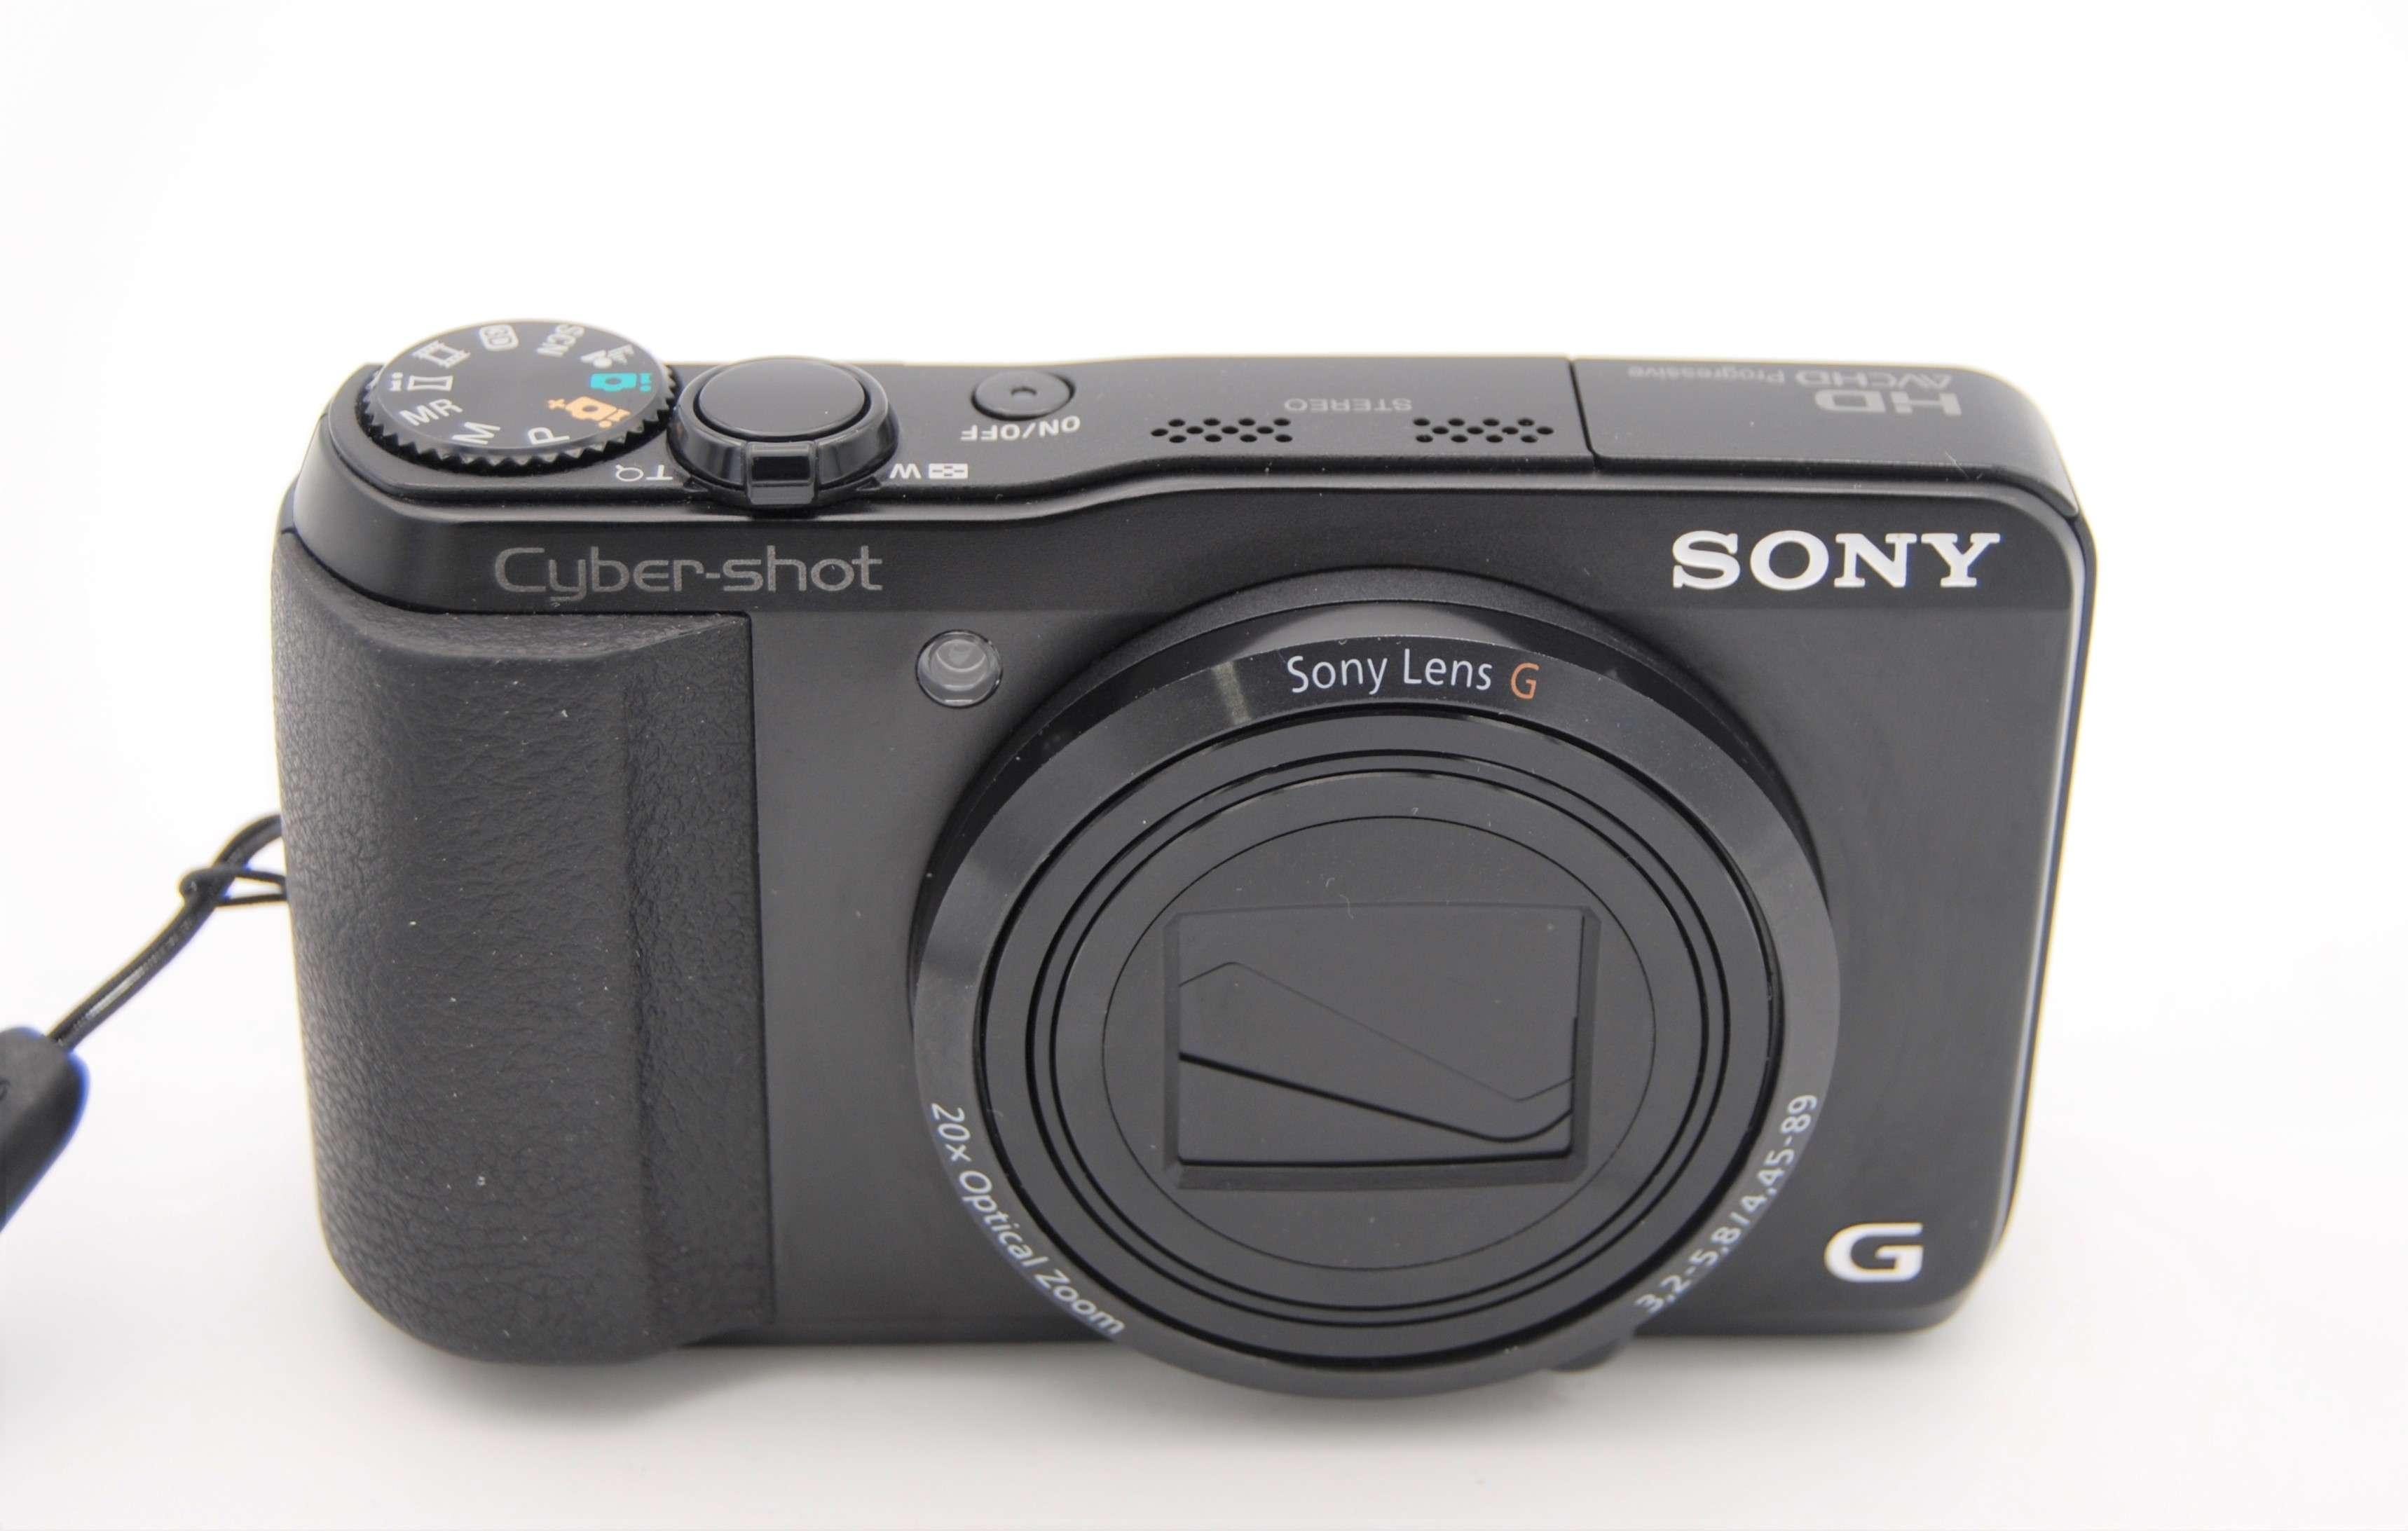 sony cyber shot dsc hx30v 18 2 mp digital camera w accessories rh ebay com au Sony DSC HX30V Manual Firmware Sony DSC HX30V